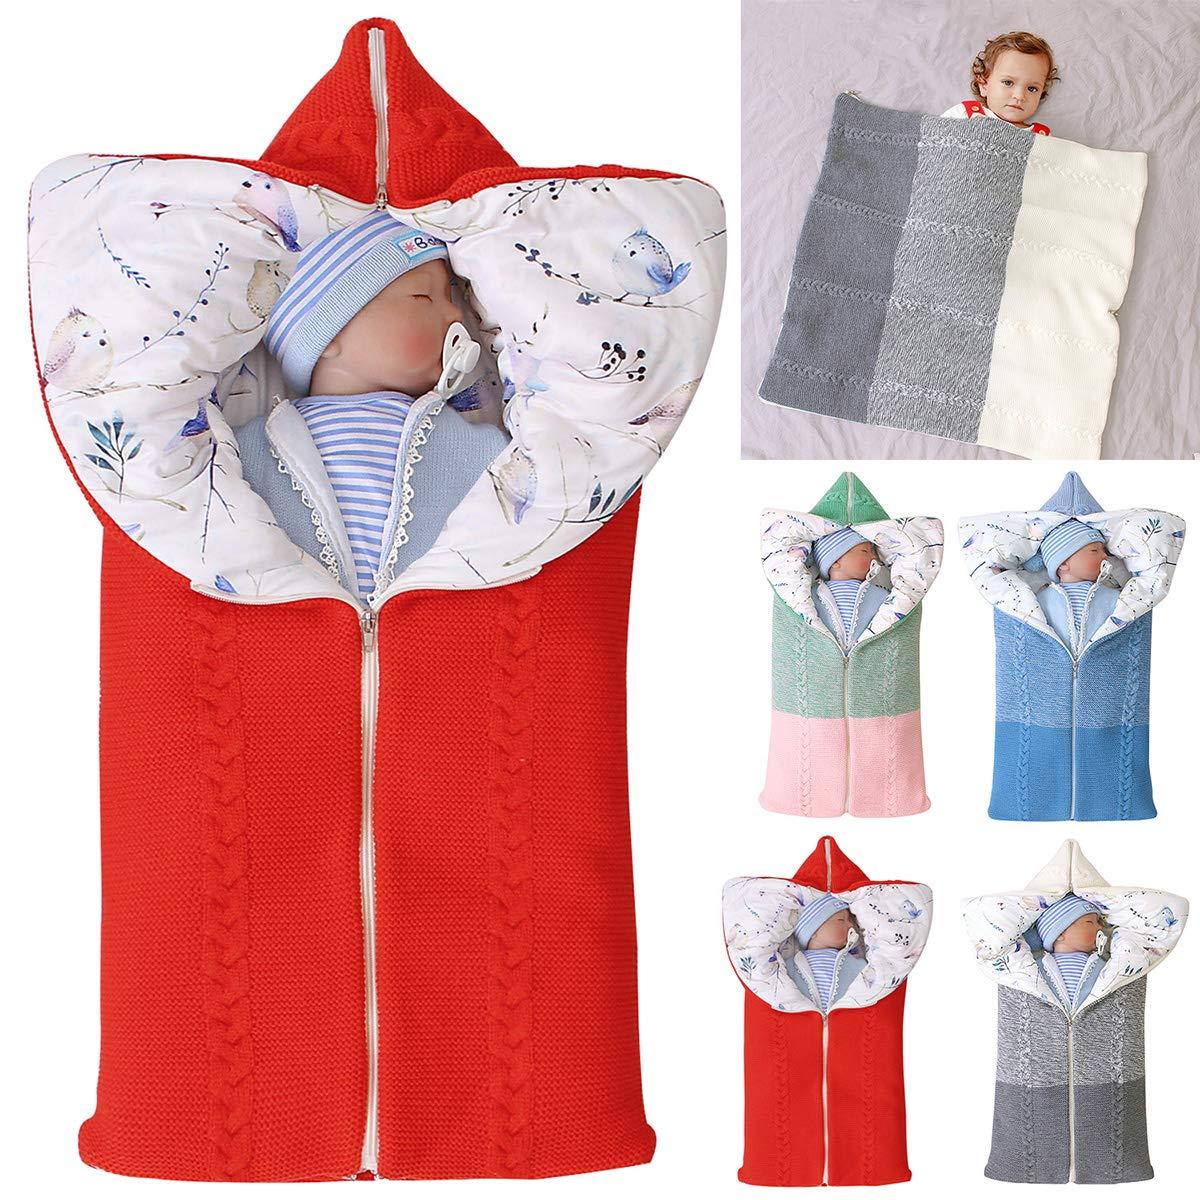 Owlike Newborn Baby Swaddle Knit Stroller Wrap Sleeping Bag,Toddler Thick Soft Warm Blanket Swaddle Sleeping Bag Grey, Medium